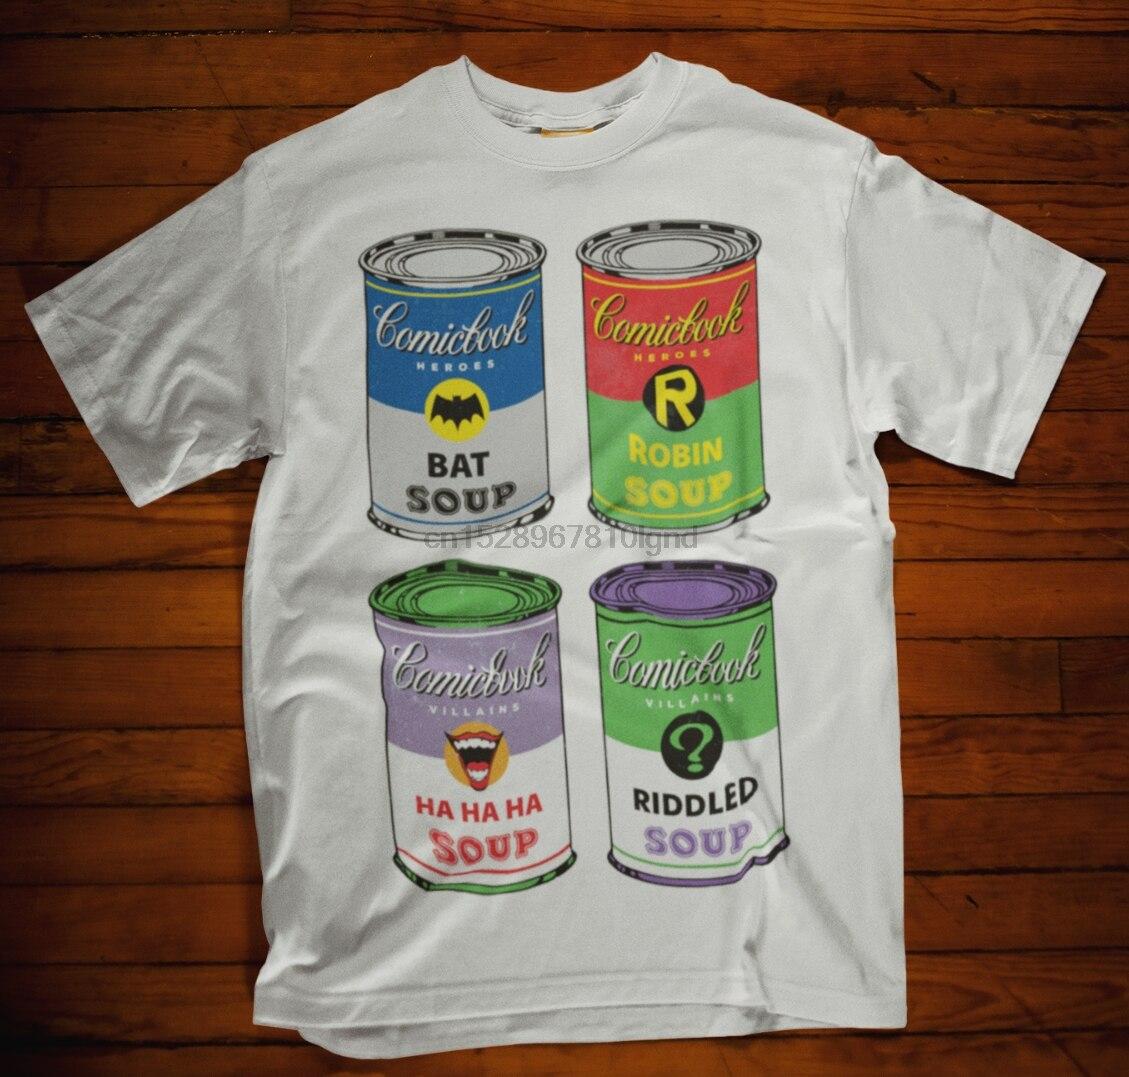 Camiseta de Comic Book Soup Can Bat acertijo Robín jahaha película Tv superhéroe Navidad